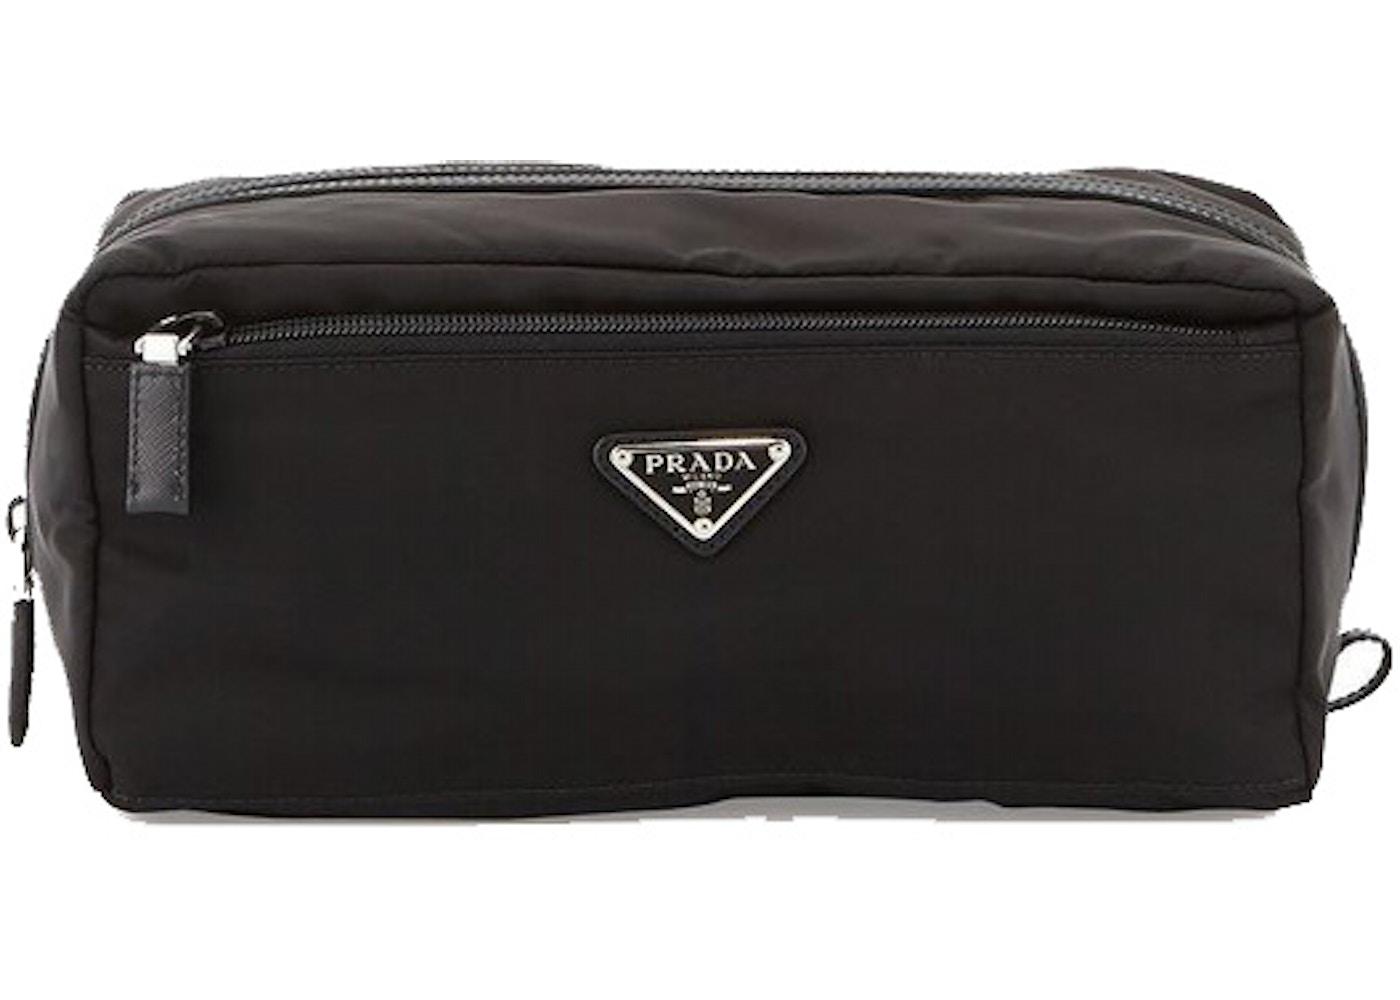 dd707928454d Buy & Sell Prada Luxury Handbags